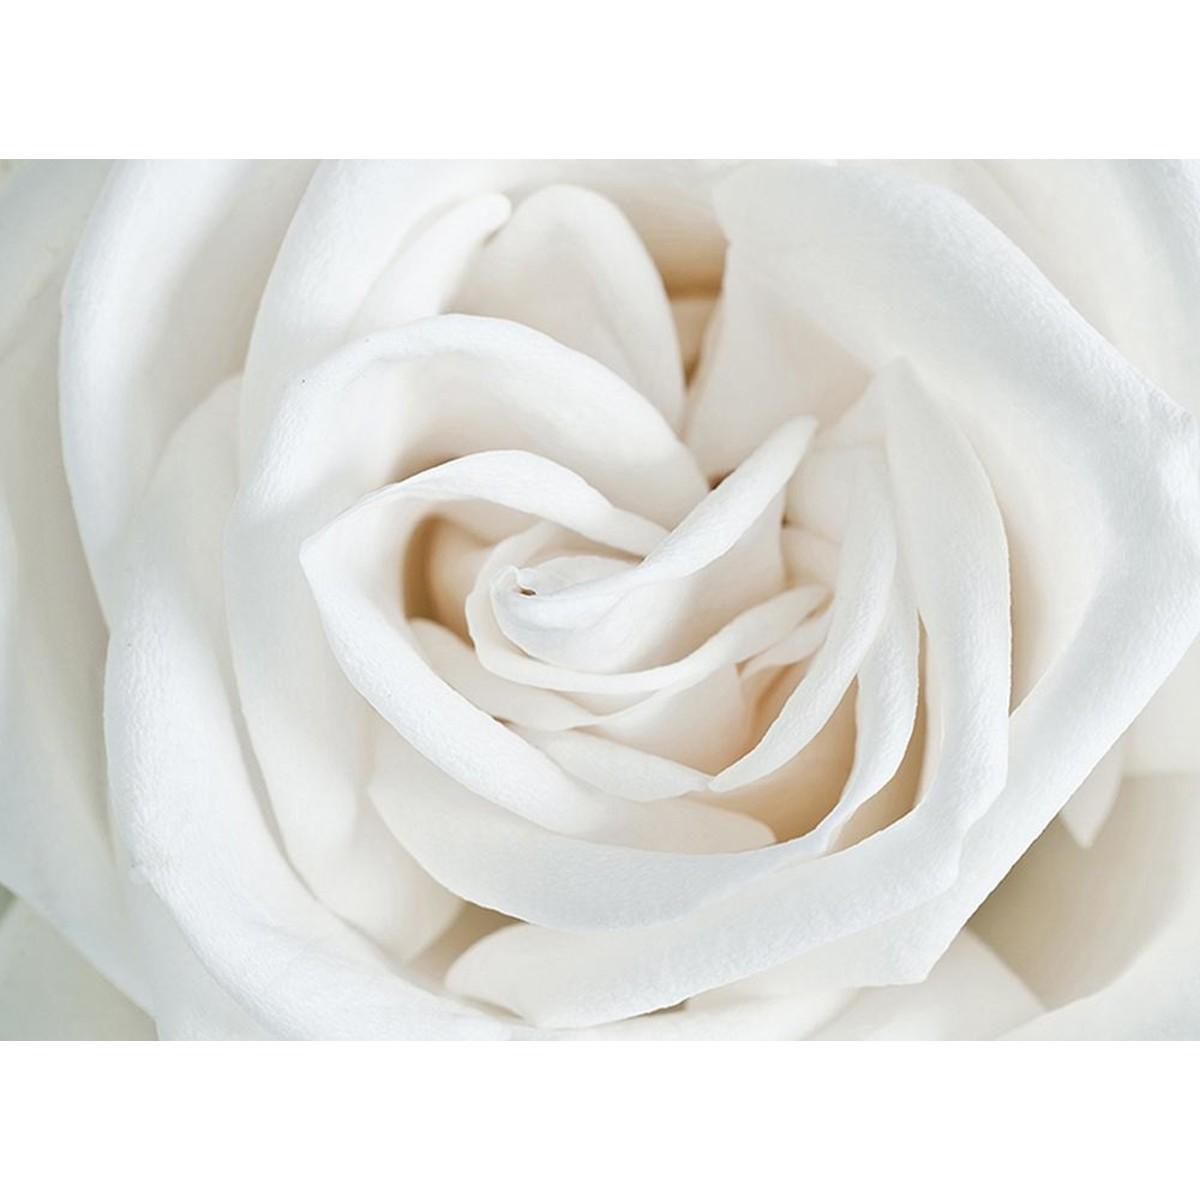 Фотообои Divino Decor Роза белая A-061 200х147 см